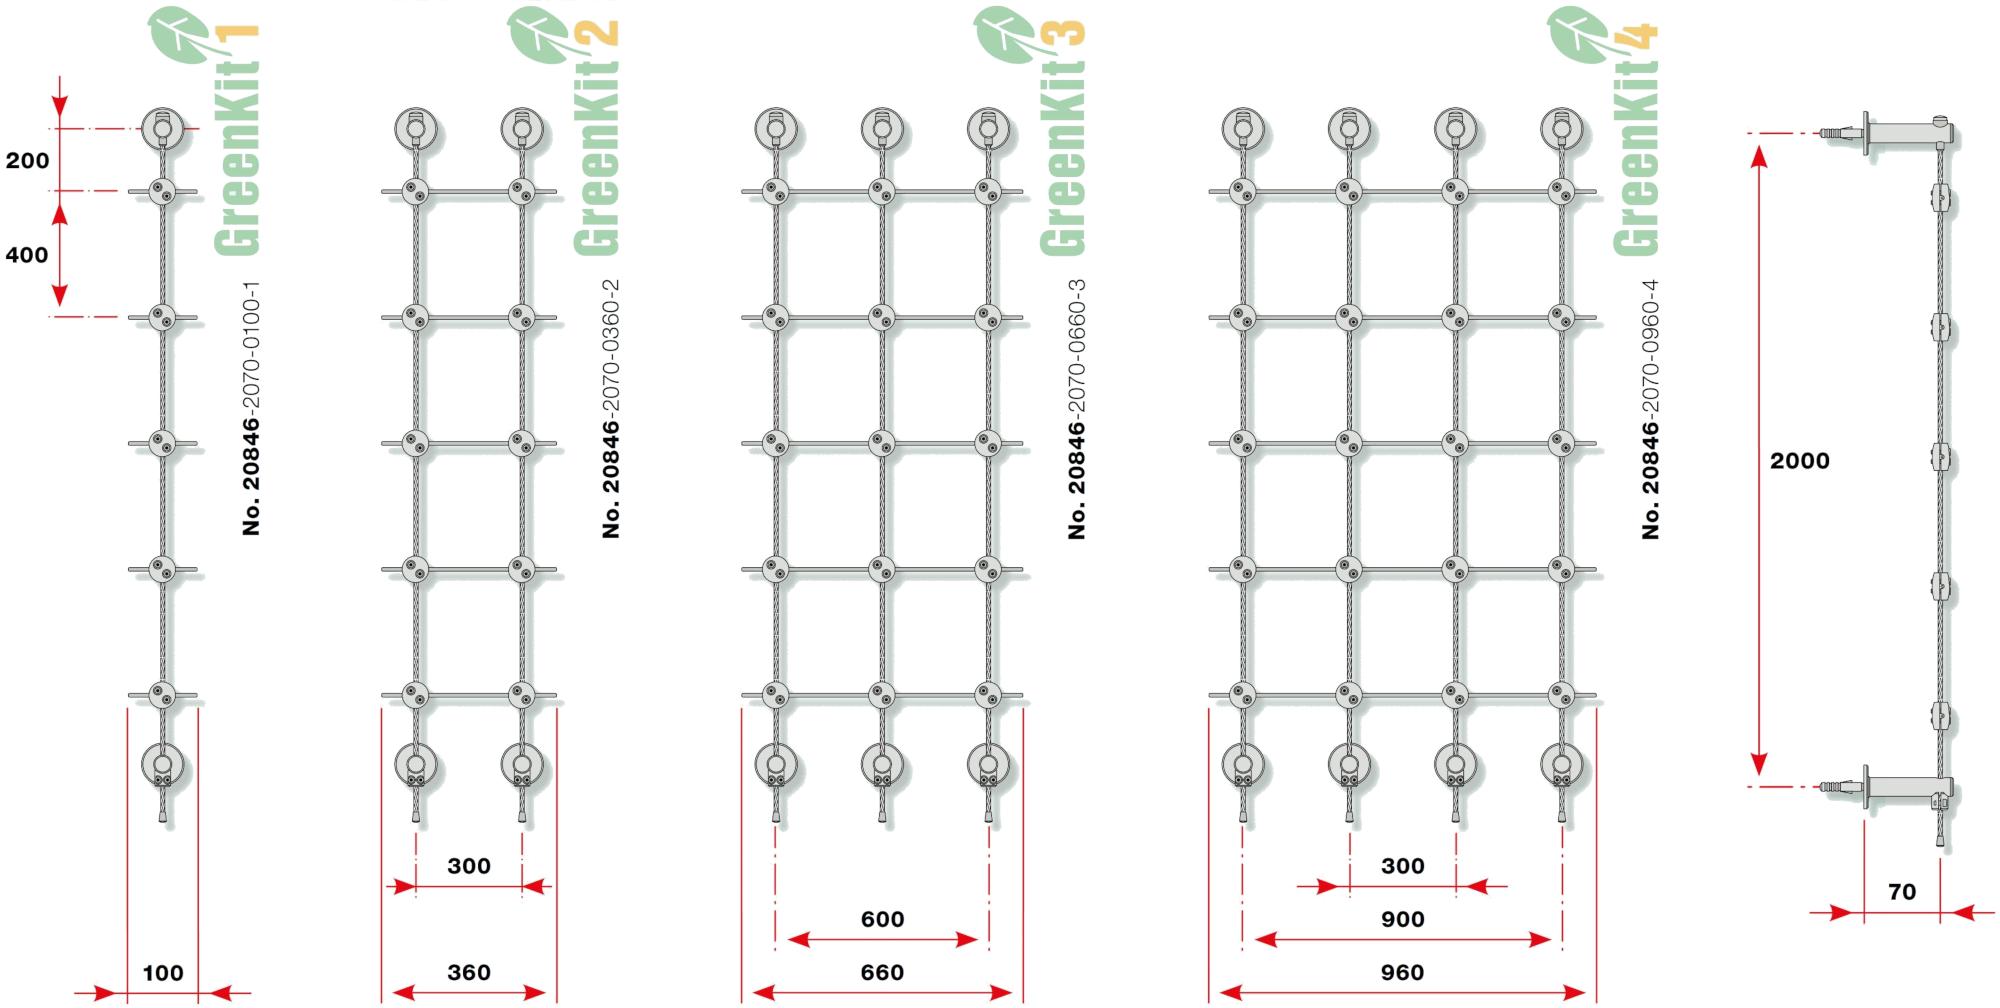 Stainless Steel Wire Trellis Kit Sizes